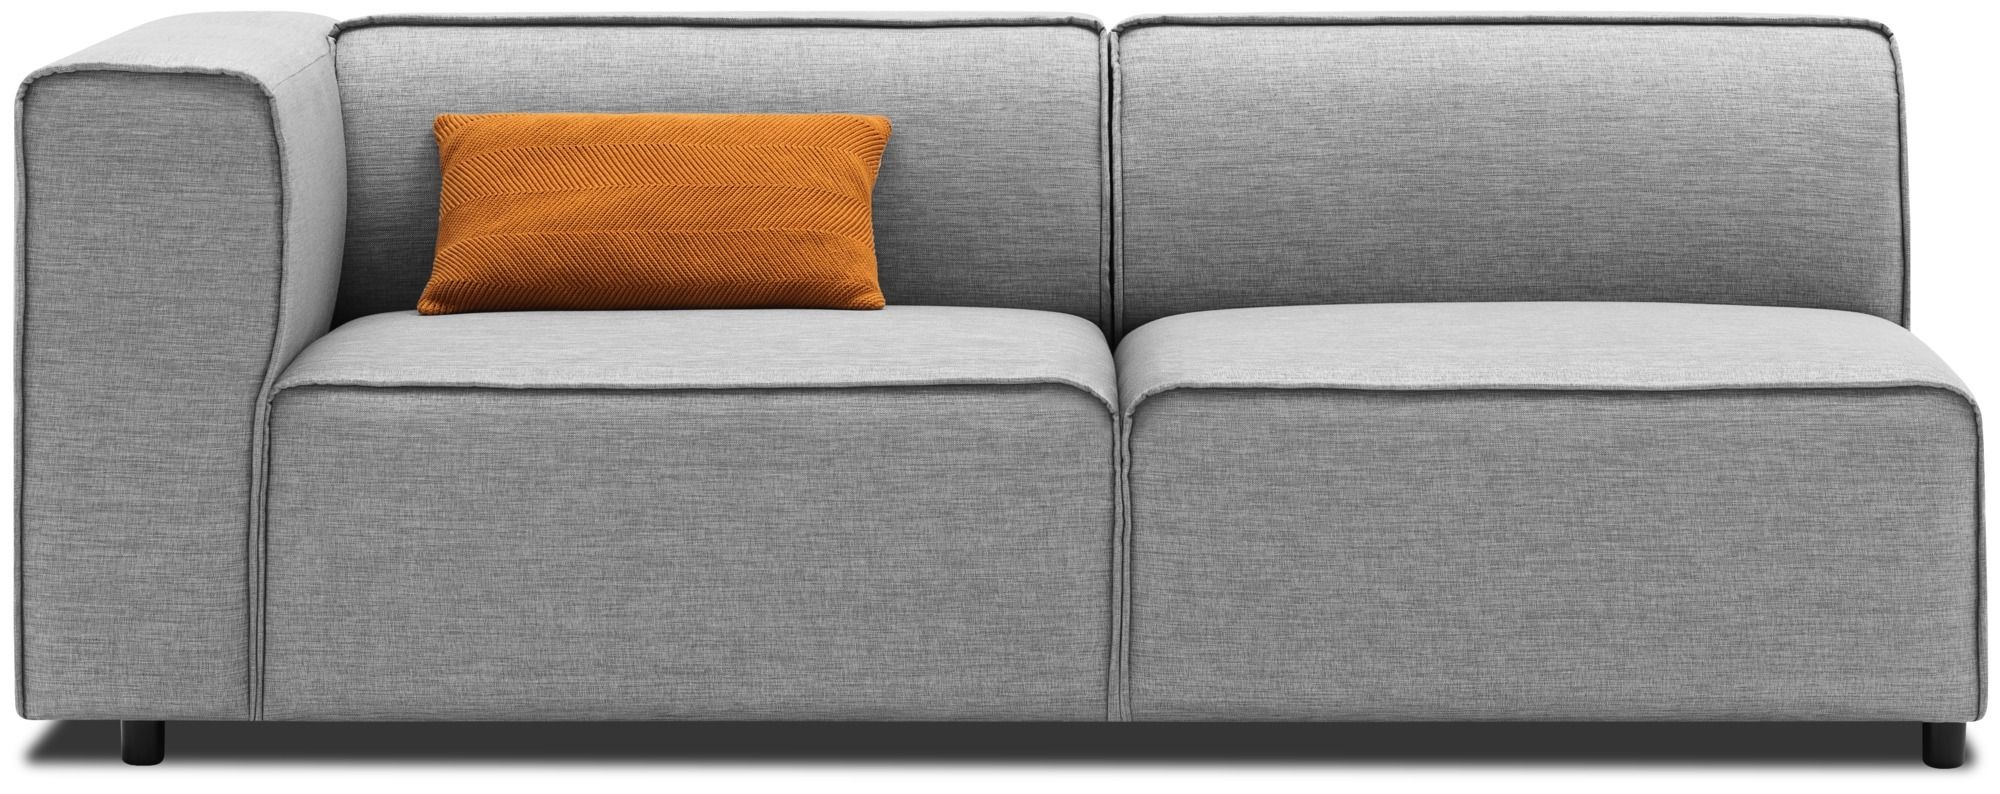 Modern Carmo Sofas Quality From Boconcept Furniture Design Living Room Living Room Furniture Sofas Living Room Furniture Layout